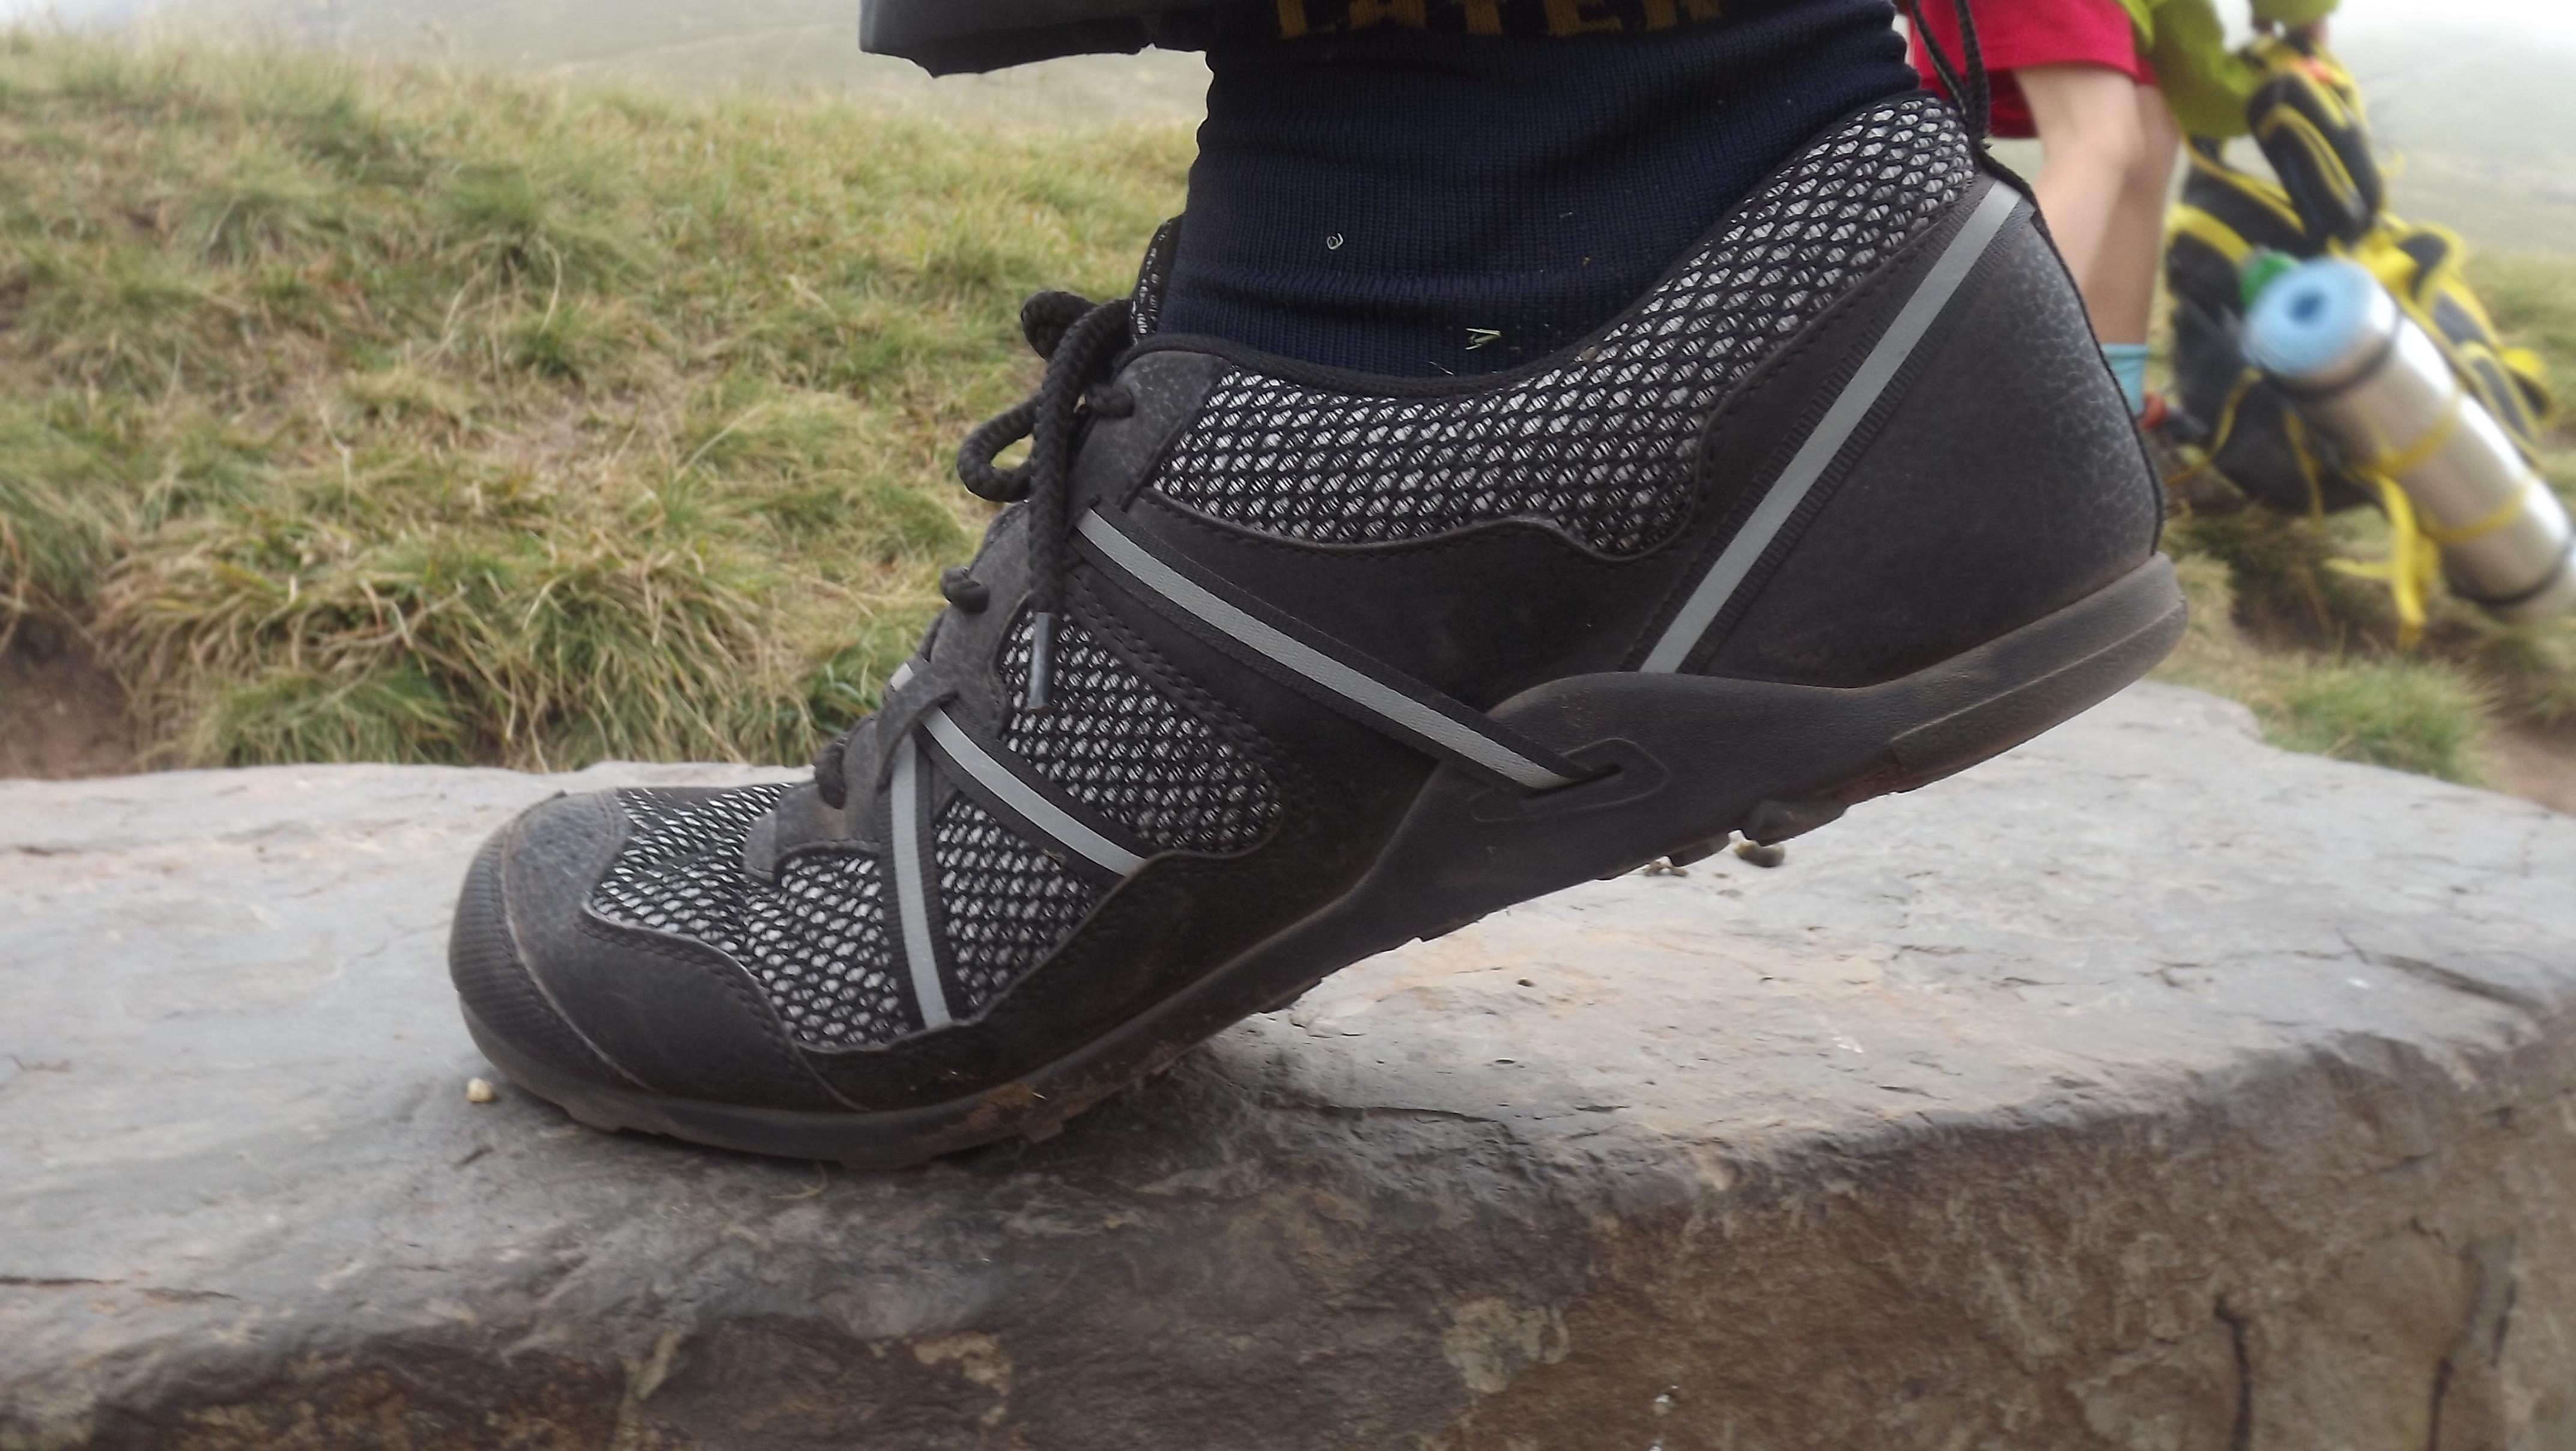 Review: Xero Shoes Terraflex – Just Up